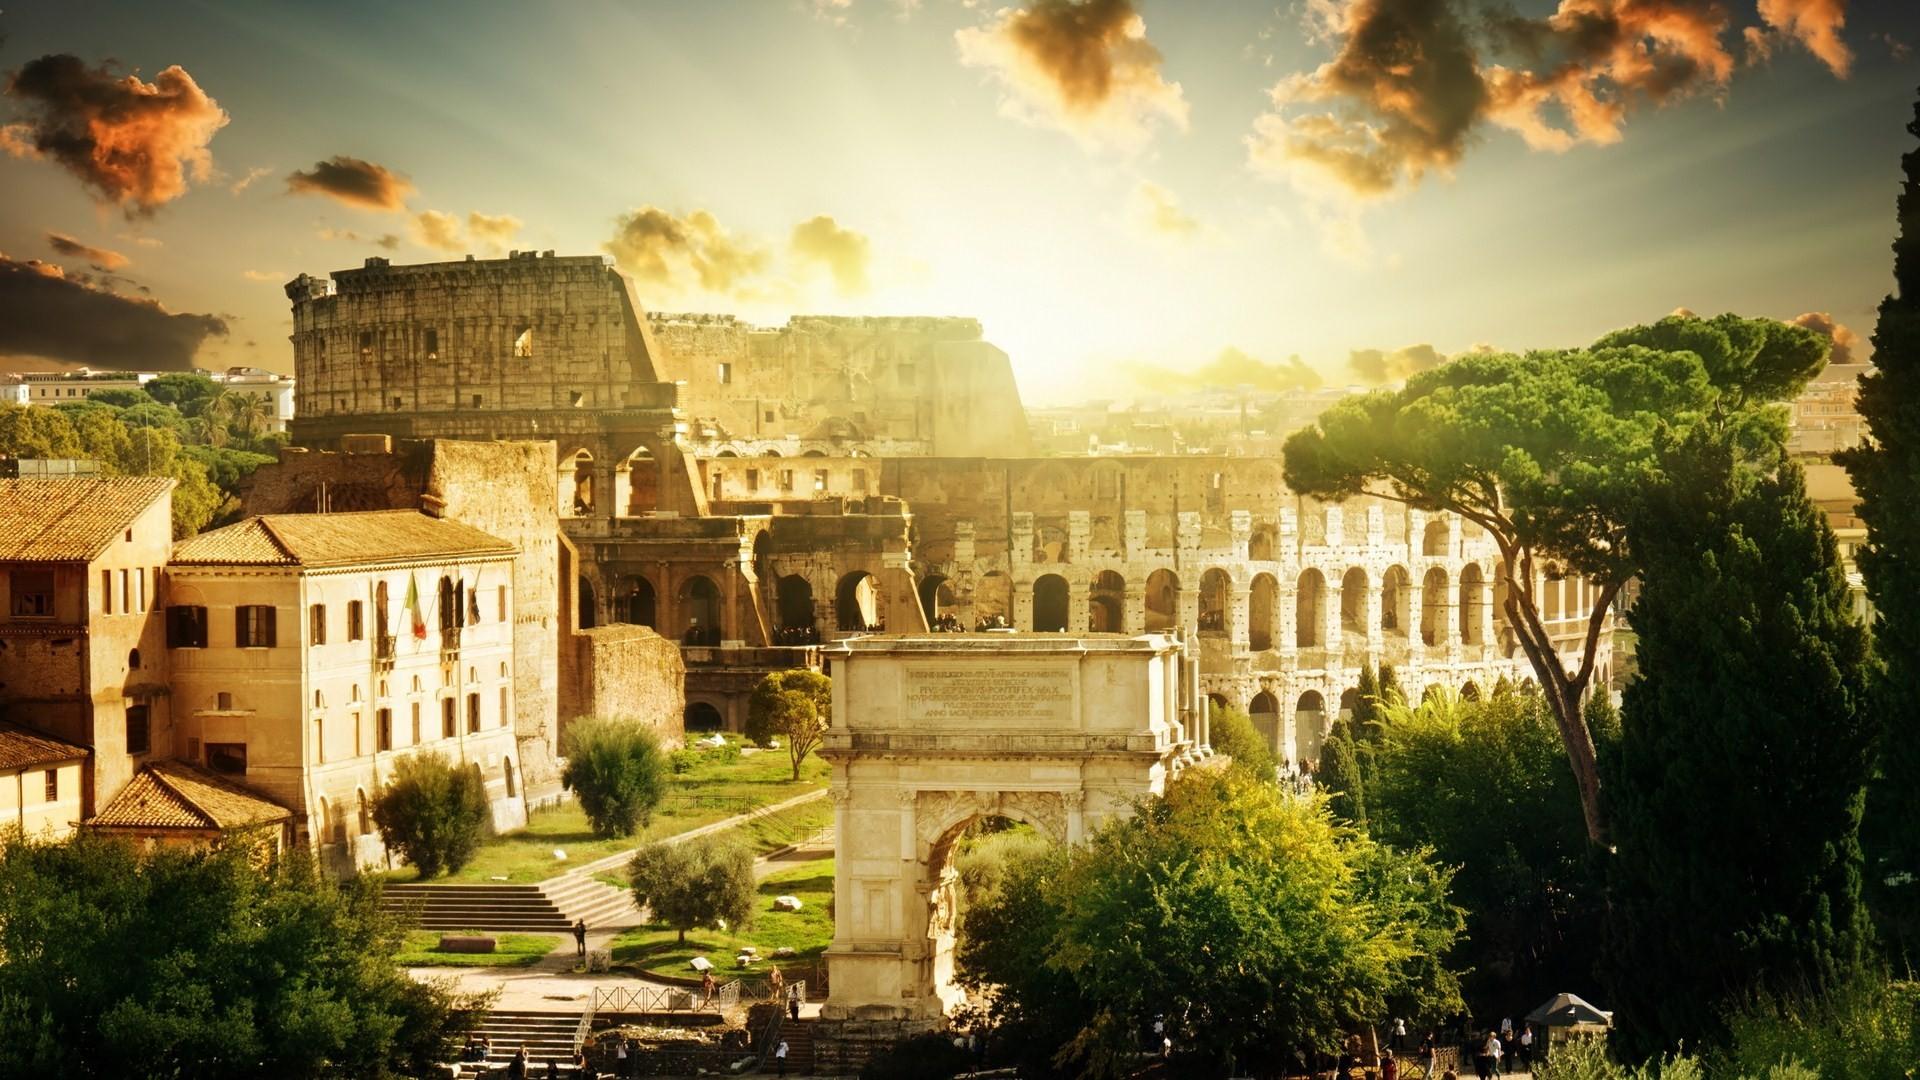 Most Inspiring Wallpaper Night Colosseum - 897386-free-download-colosseum-wallpaper-1920x1080-ios  Trends.jpg